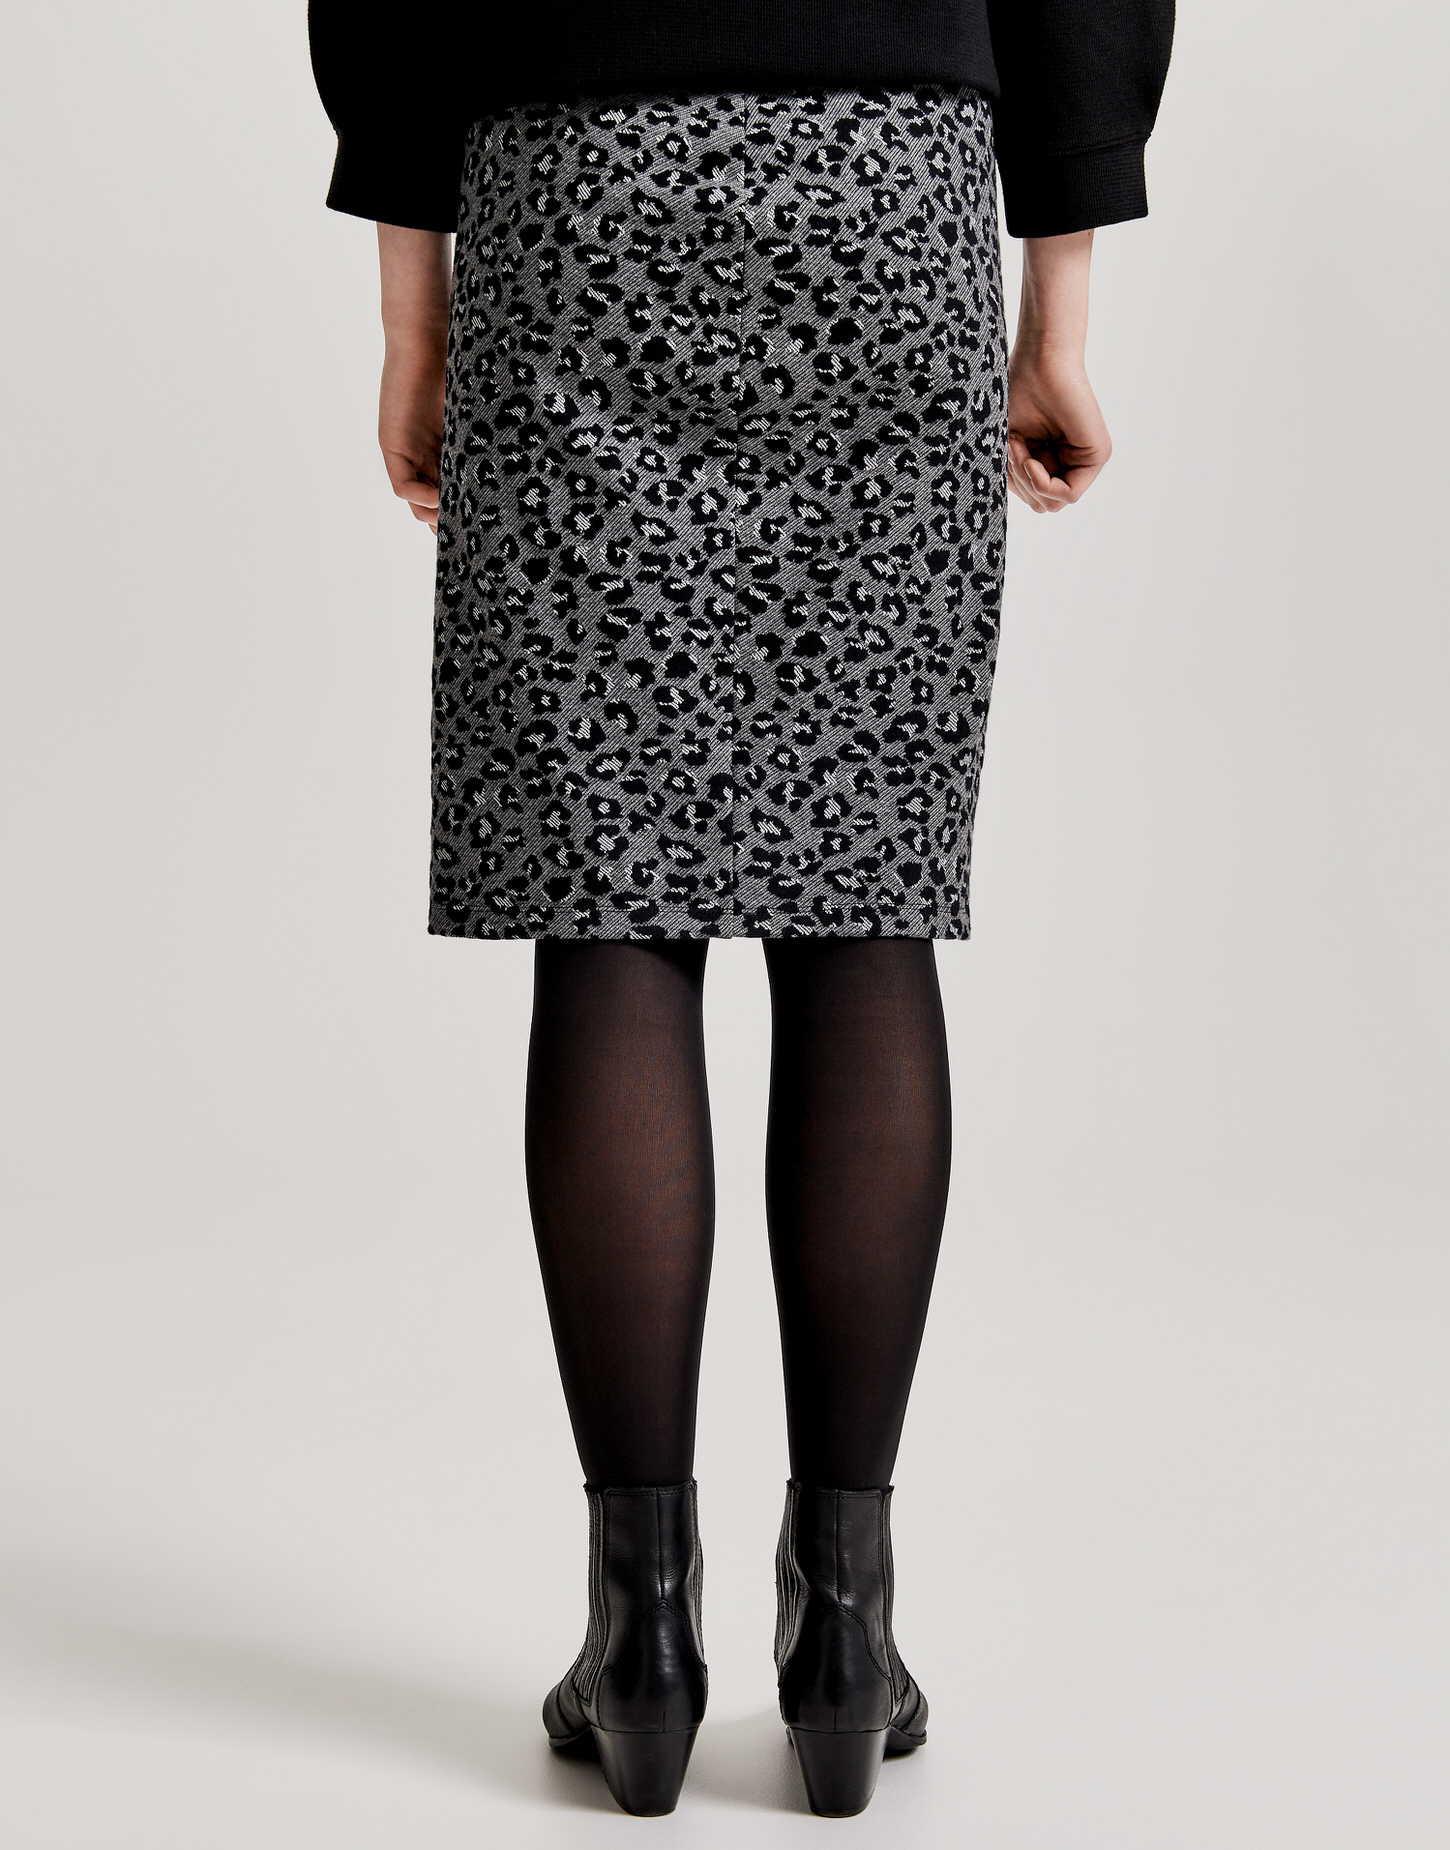 OPUS Röcke in dunkel-grau günstig kaufen